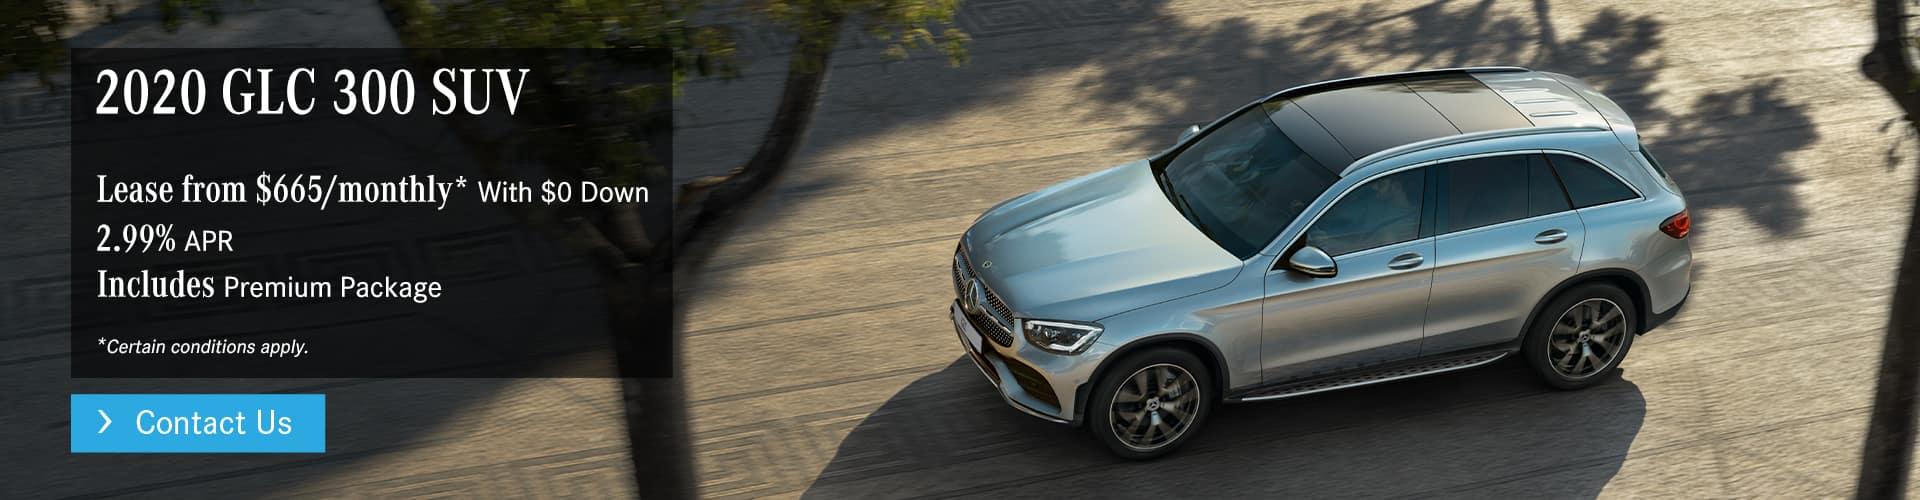 2020 GLC 300 SUV Offer at Mercedes-Benz Burlington